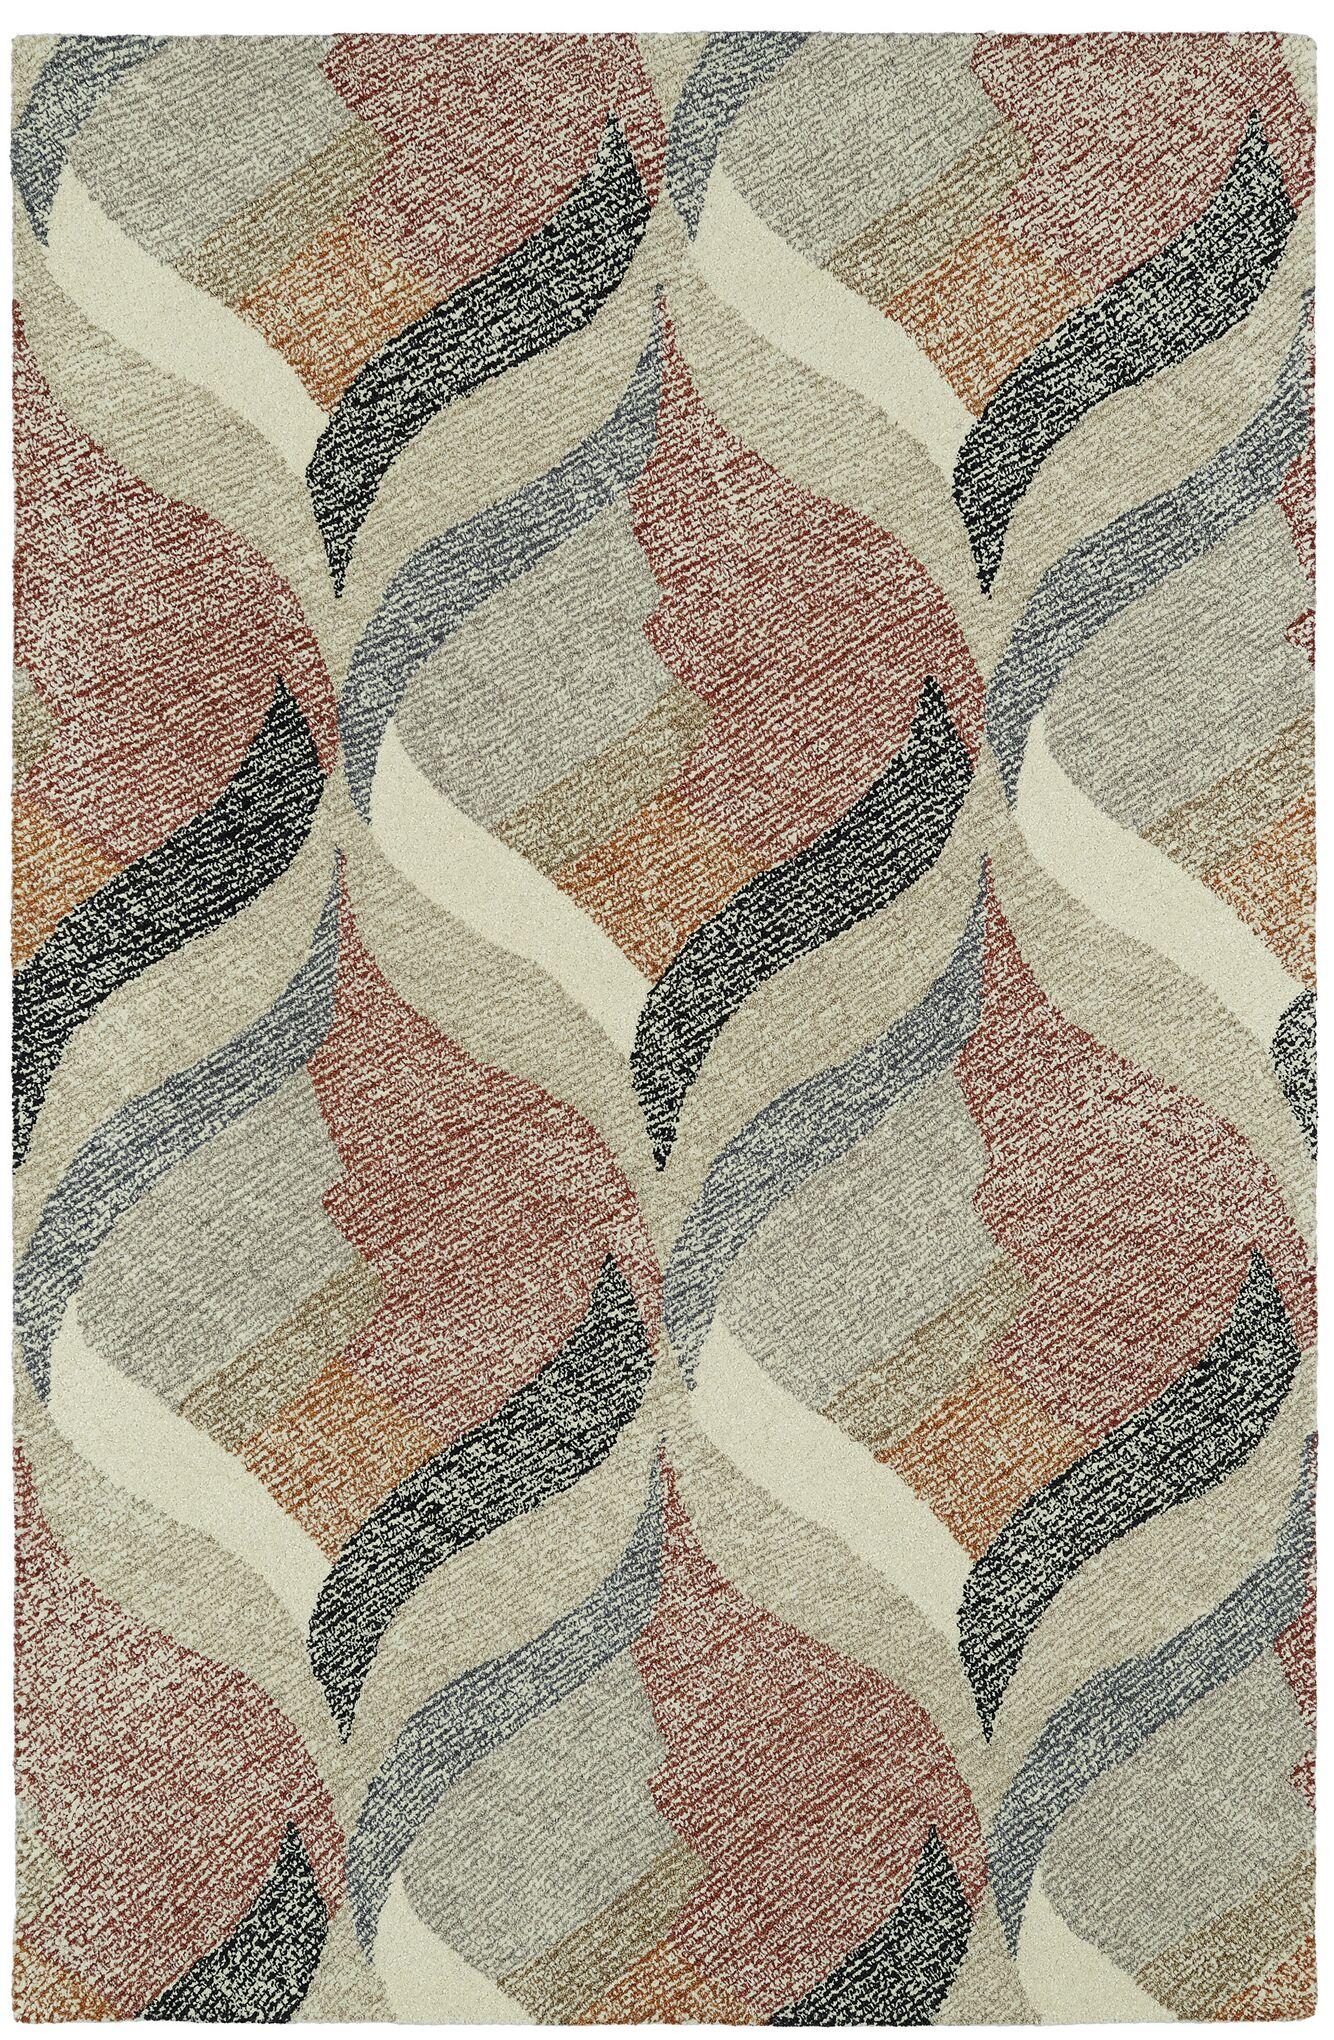 Louane Hand-Tufted Area Rug Rug Size: Rectangle 5' x 9'